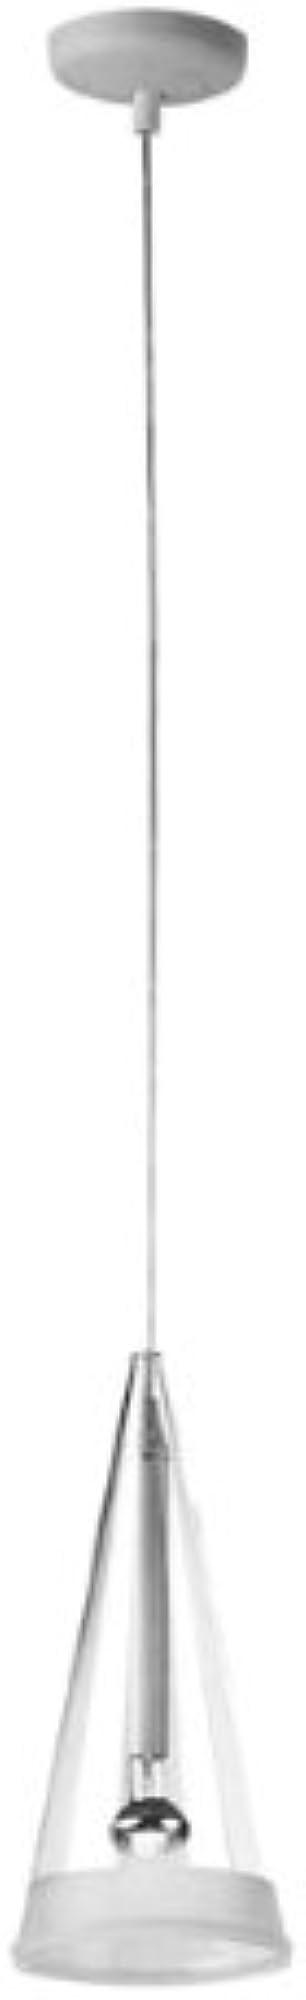 Flos - lampadario F2410000